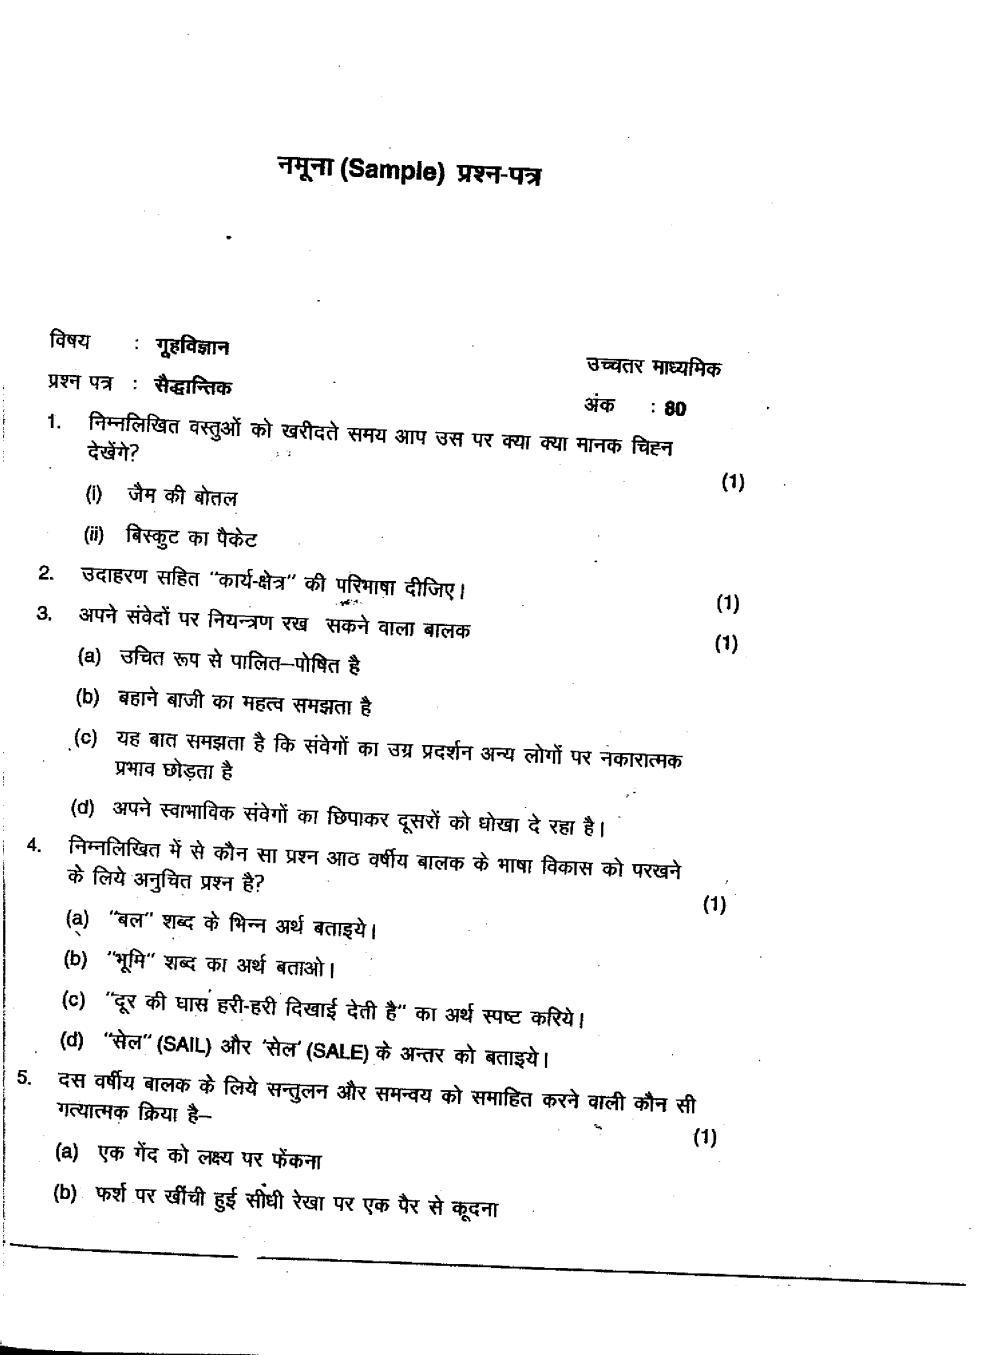 NIOS Class 12 Sample Paper 2020 - Home Science (Hindi Medium) - Page 1